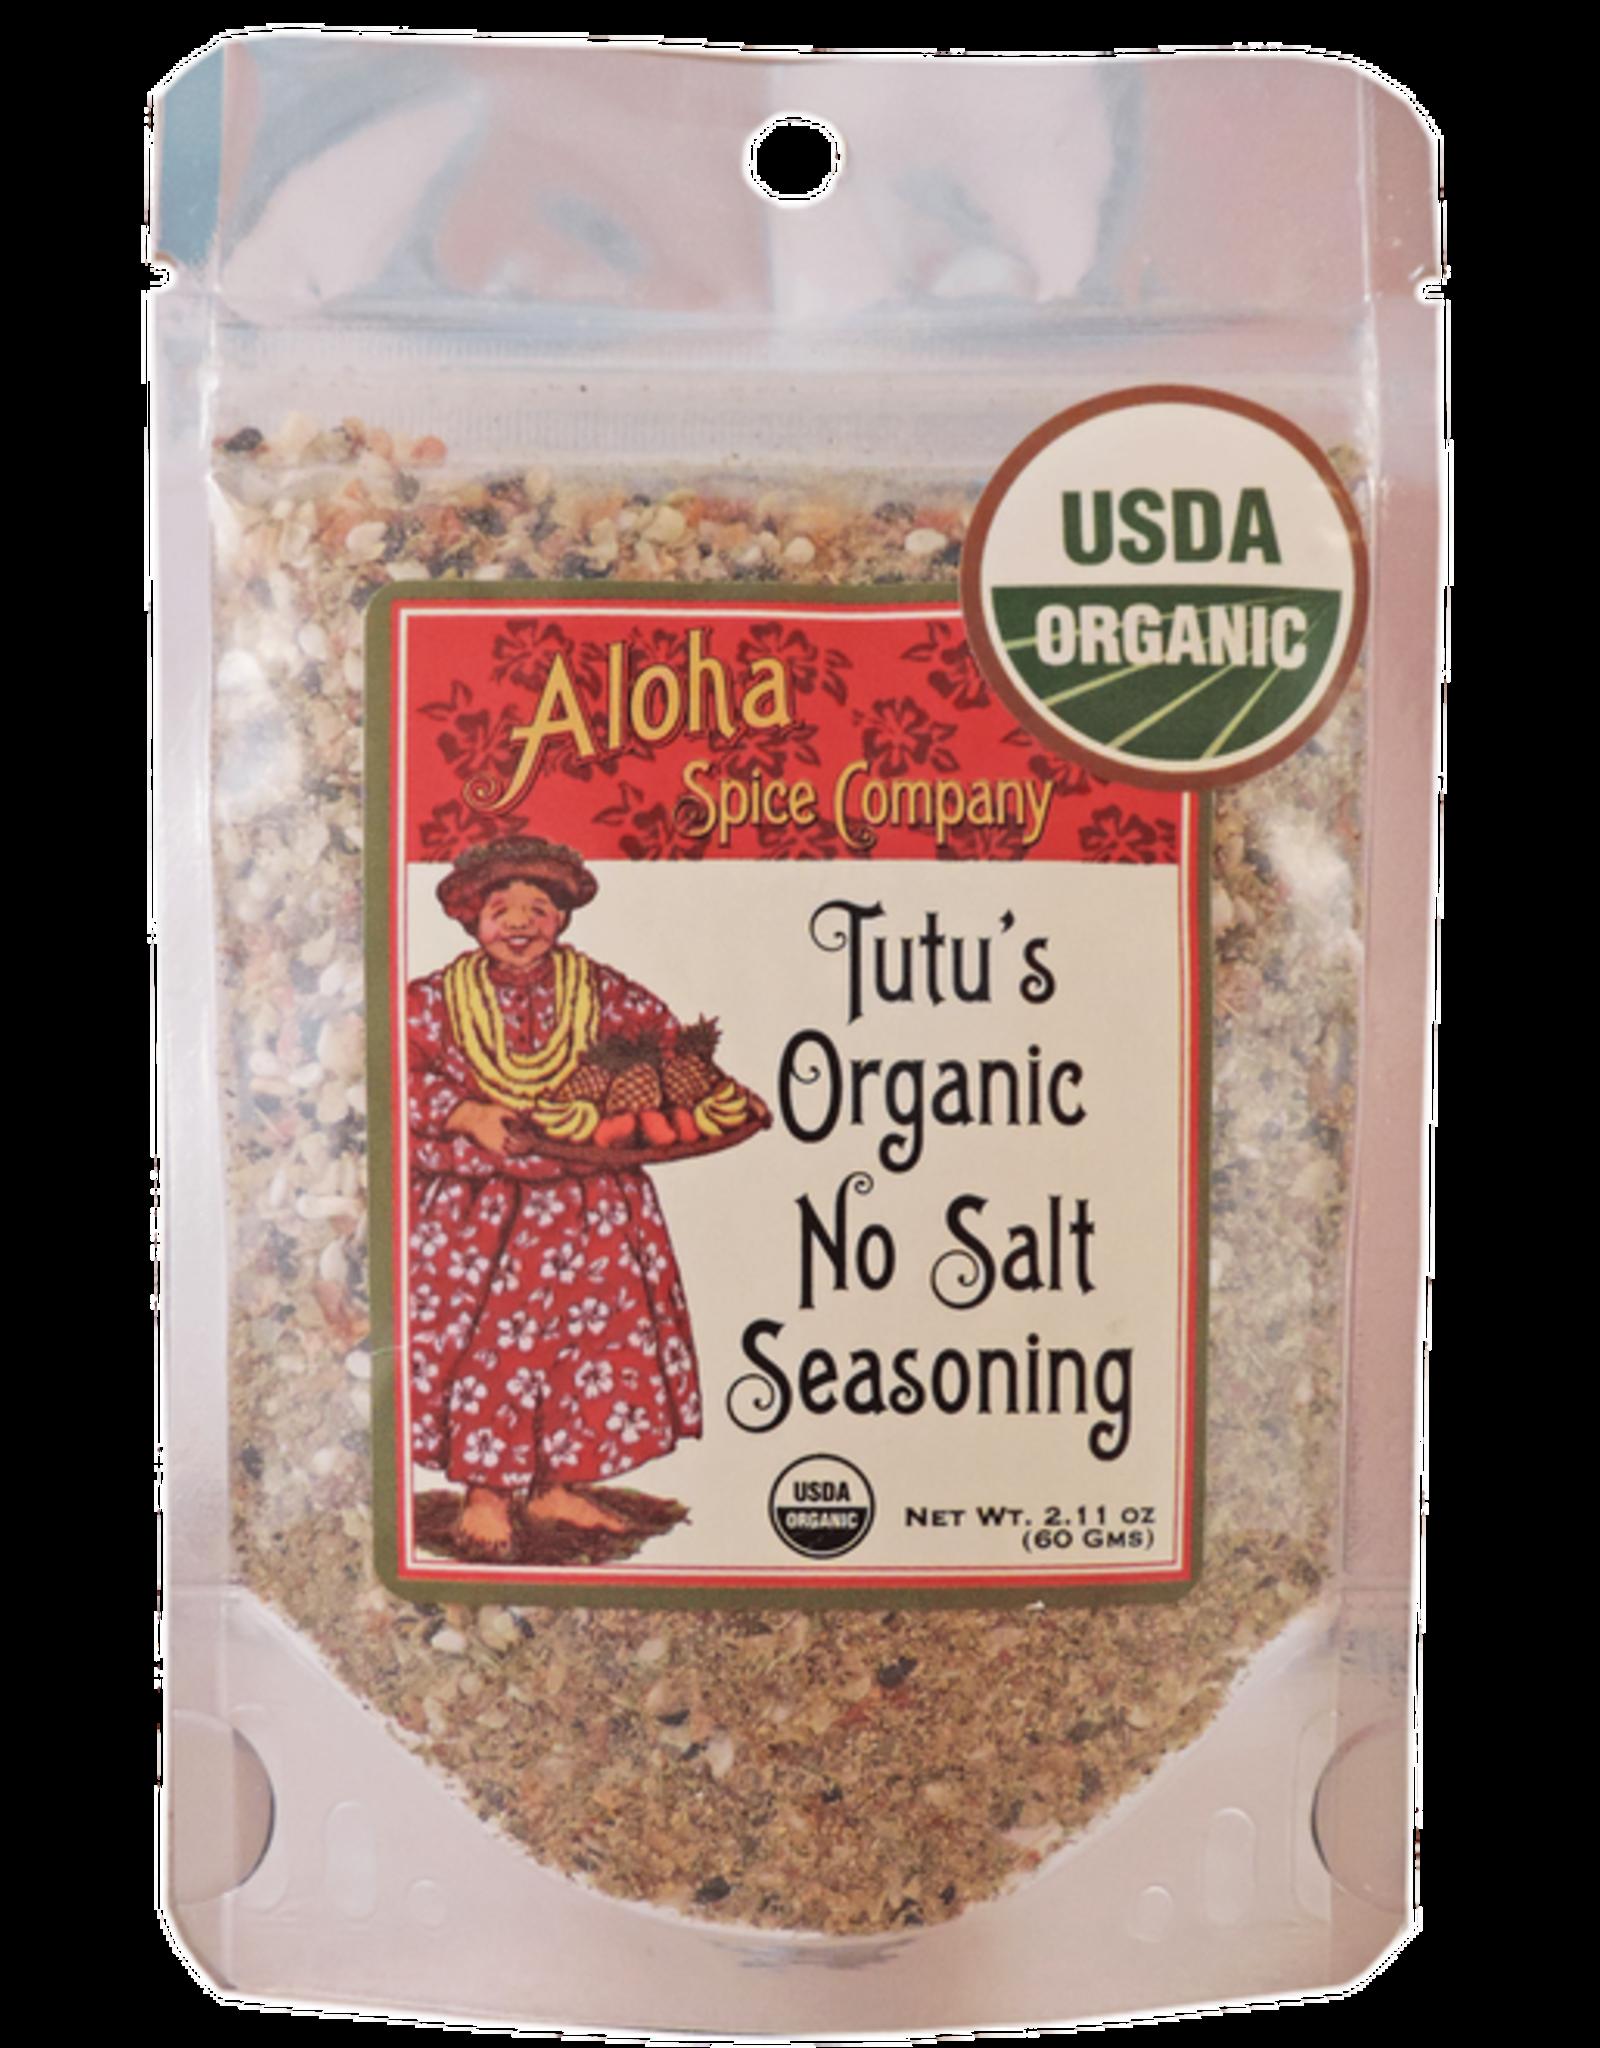 Aloha Spice Co. Tutu Organic Bag - No Salt